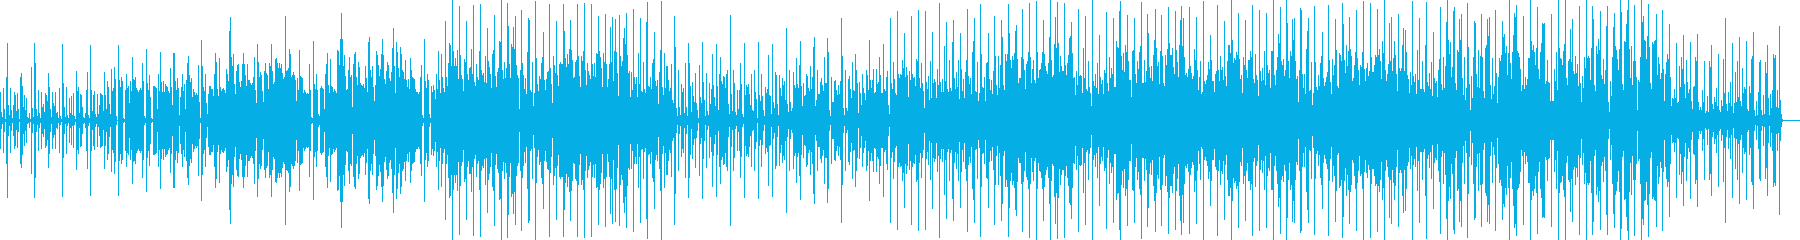 KANT洗練・飄々としたBGM20618の再生済みの波形